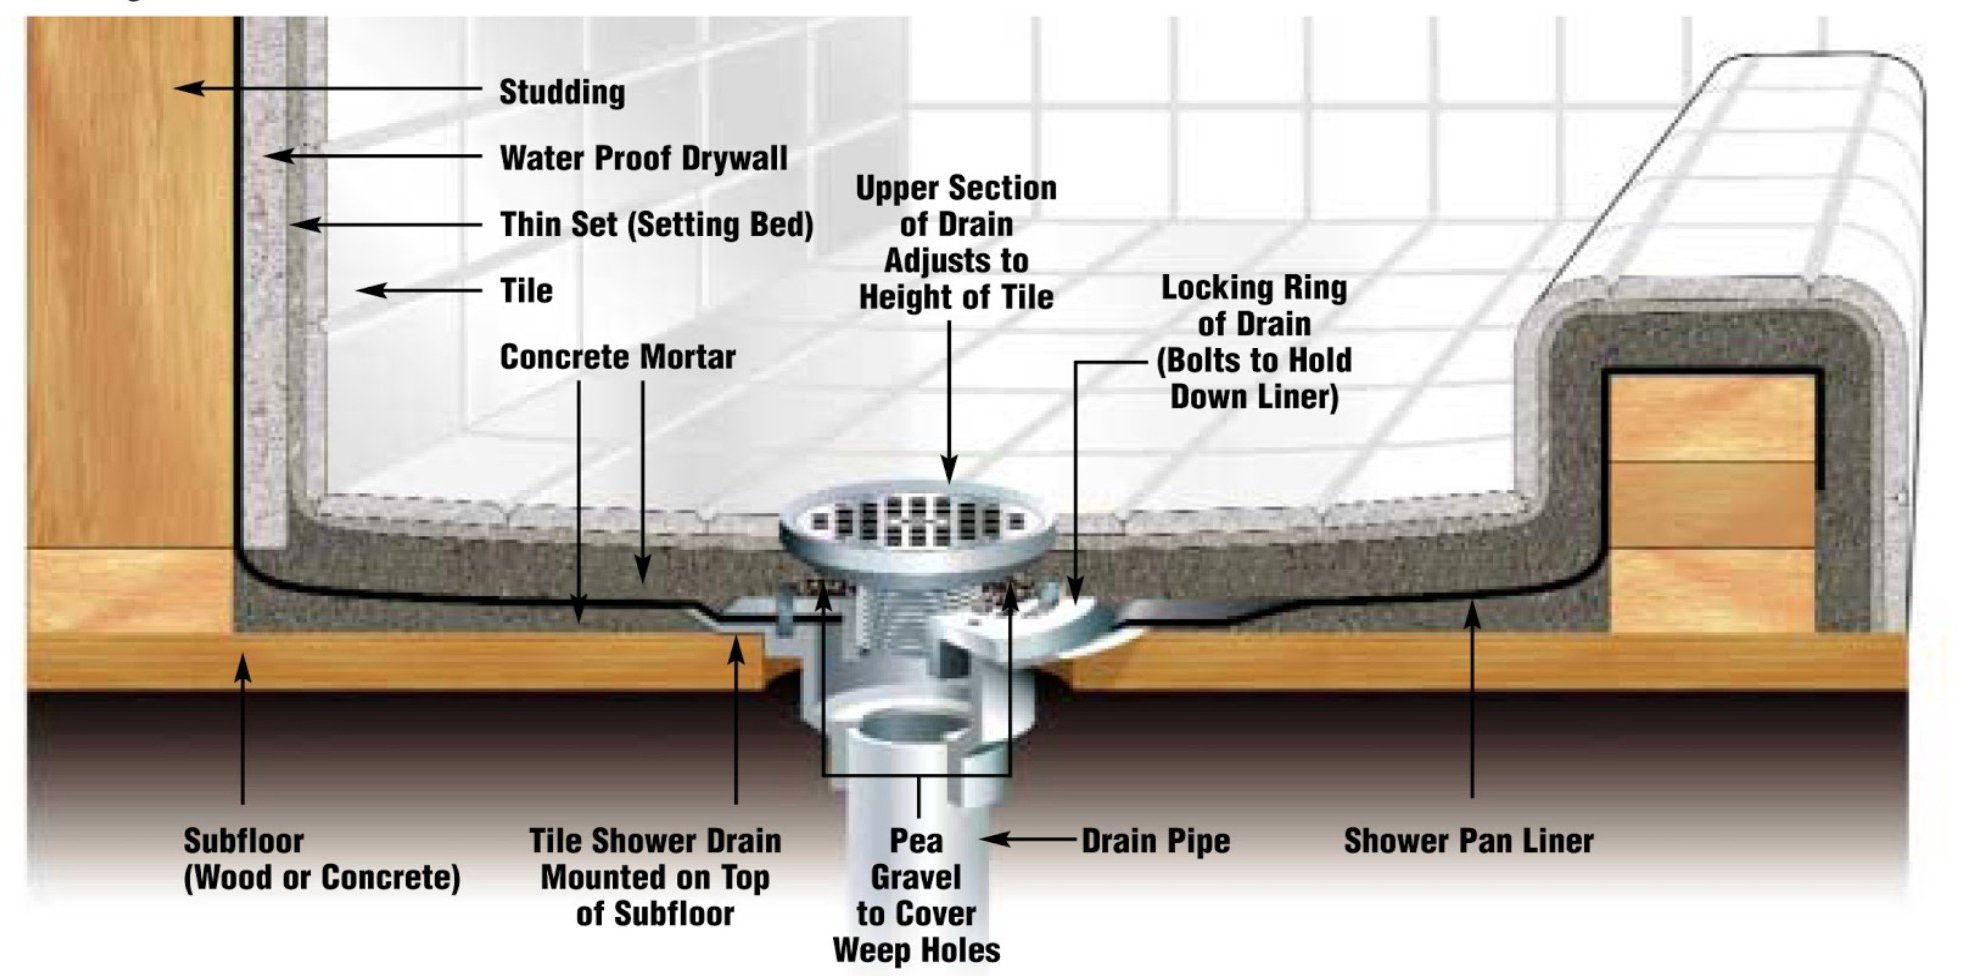 Pofuzen Linear Shower Drain Base (flange) with Rubber Gasket. Linear drain kit, ABS Base, PVC Flange - Ideal for Tile Insert Floor Drains - Compatible with 36 inch and 48 inch Linear Drains by Pofuzen (Image #7)